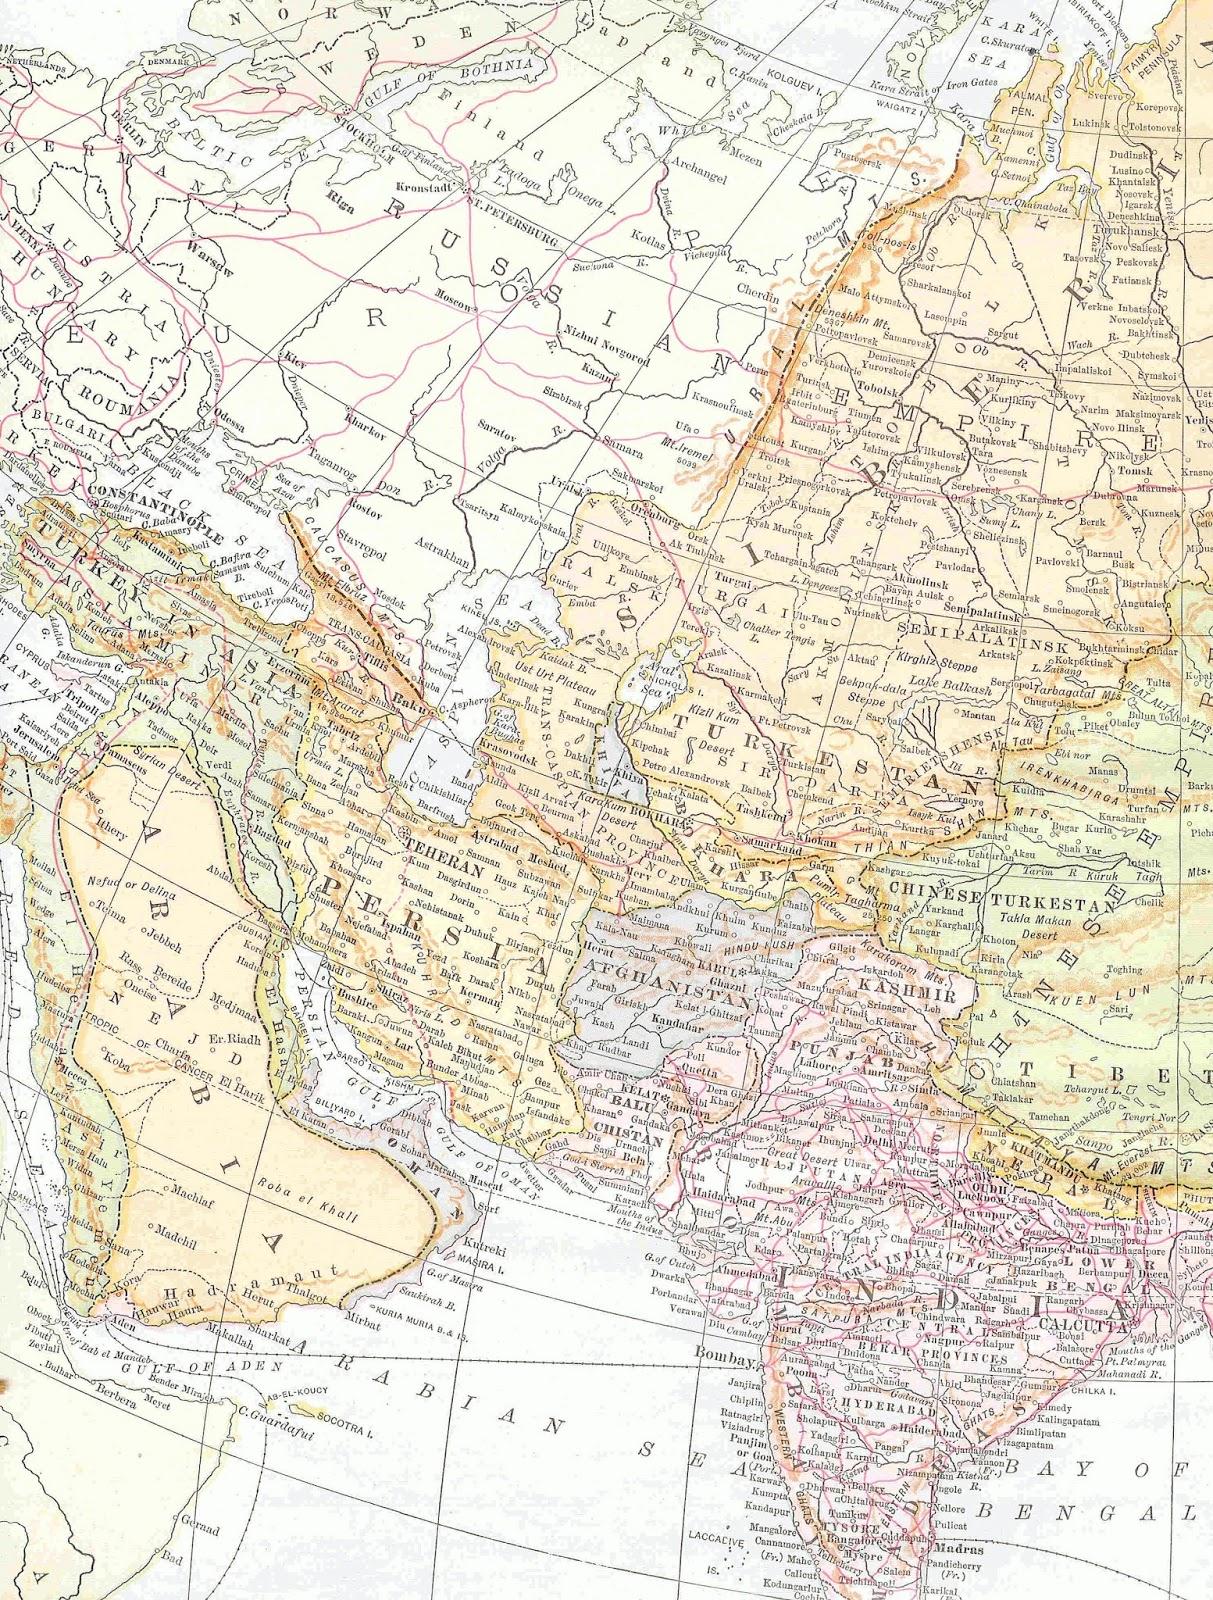 Antique Images: Free Map Clip Art: Vintage Map of Middle ...